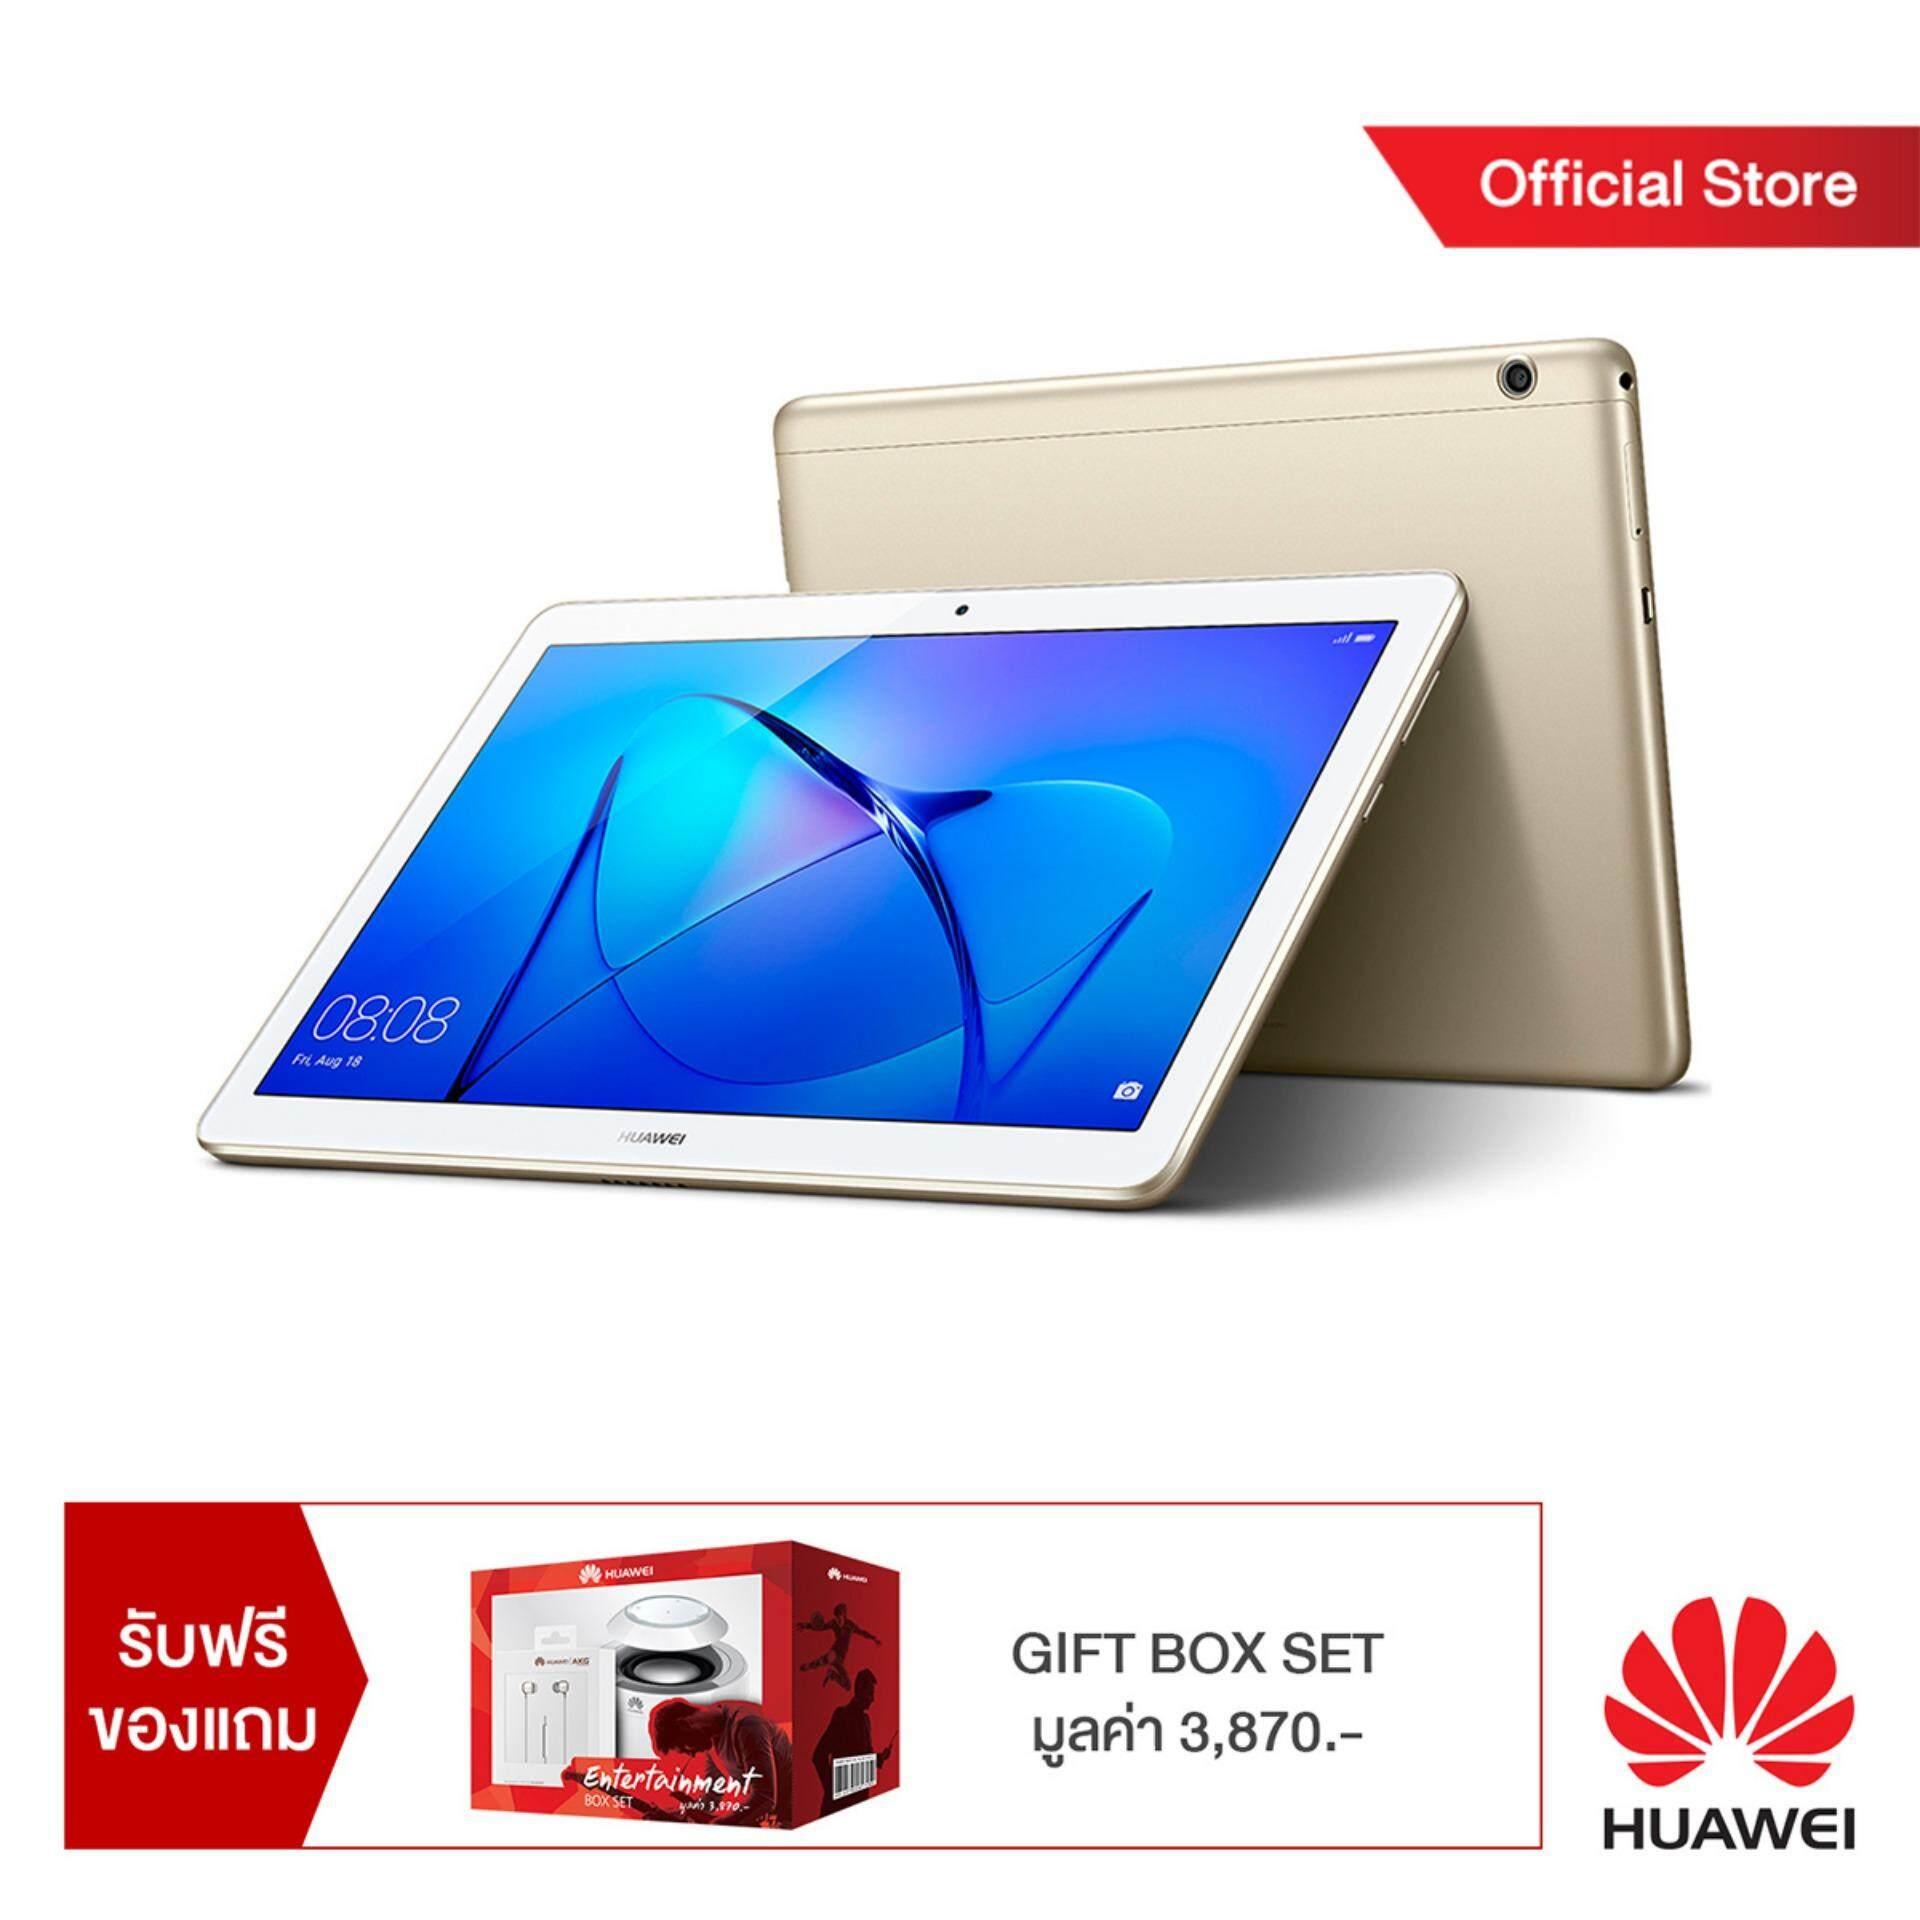 Huawei MediaPad T3 10.0 4G 16GB Luxurious Gold ***พิเศษ!! รับฟรี Box Set มูลค่า 3,870 บาท***